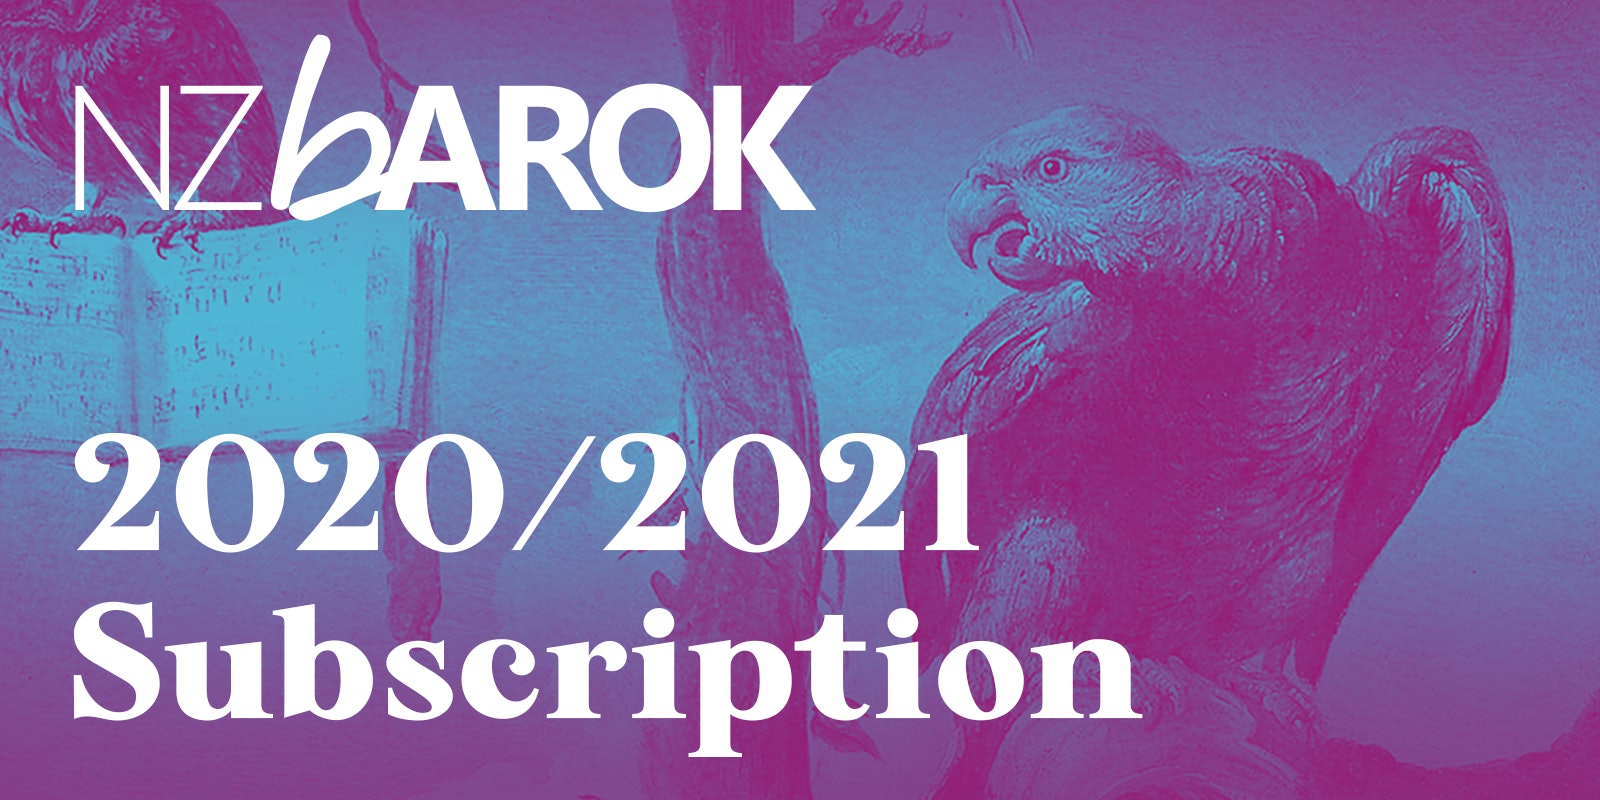 NZ Barok Subscription